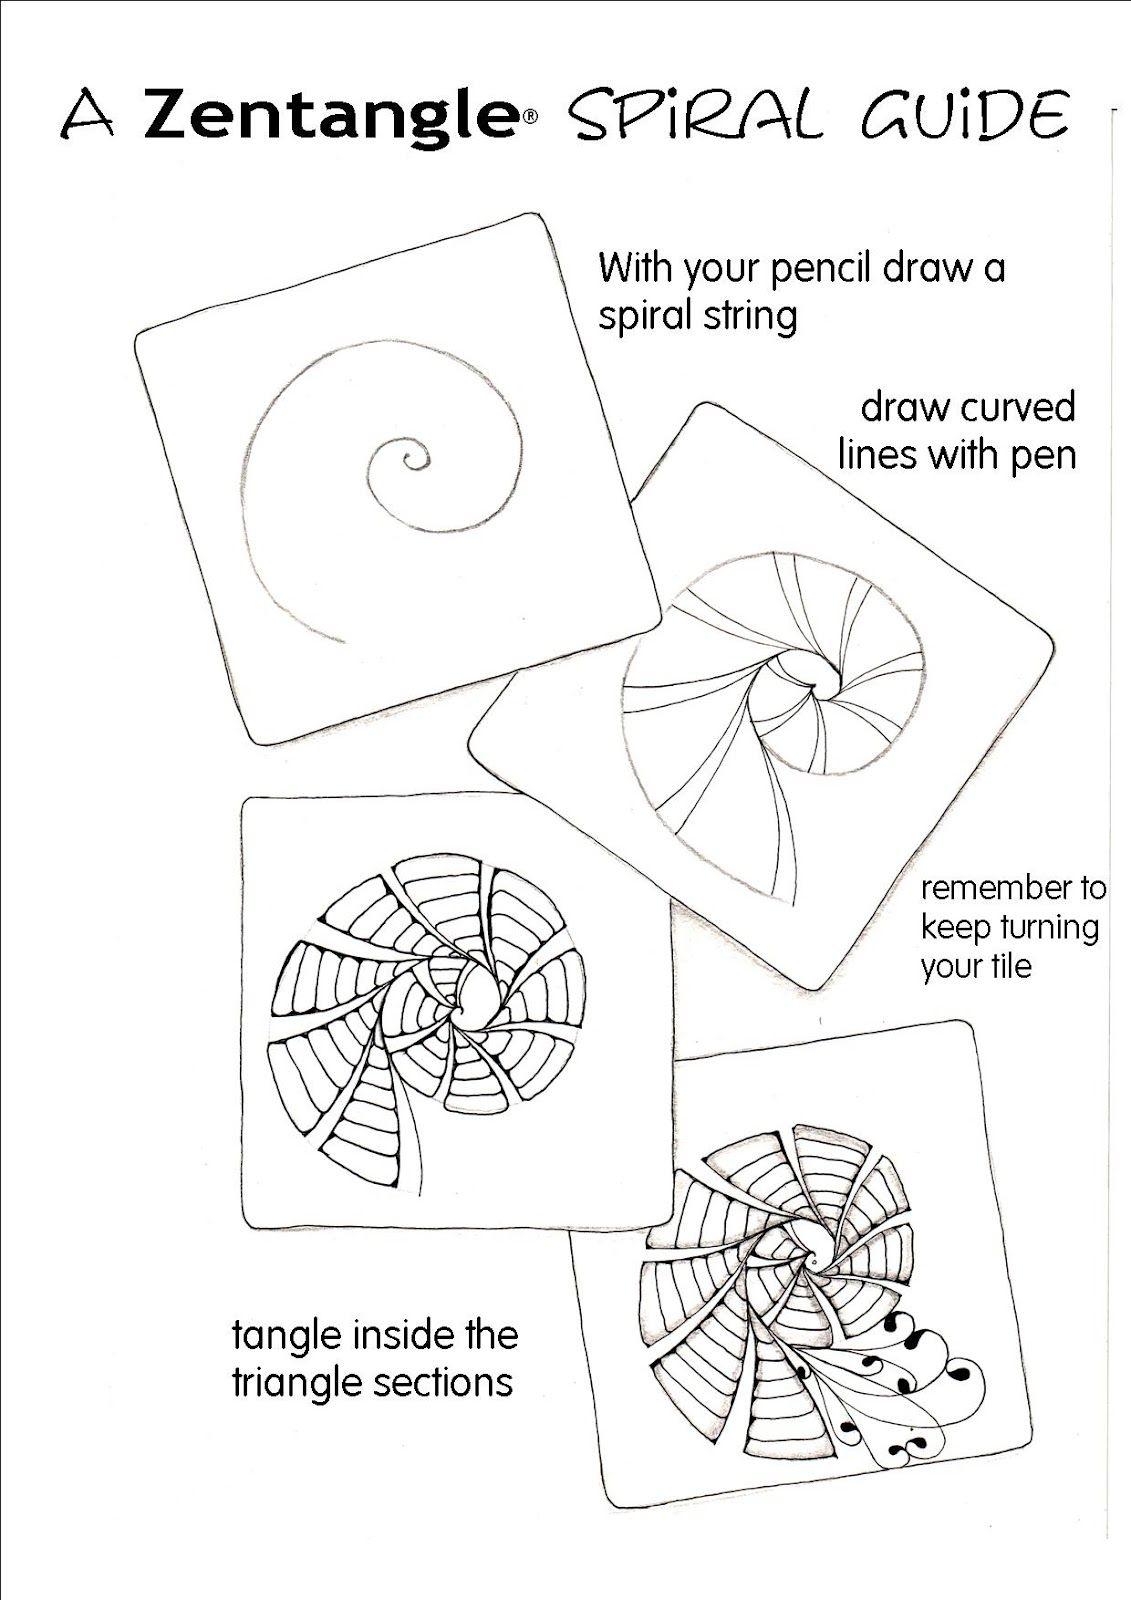 A Zentangle Spiral Guide